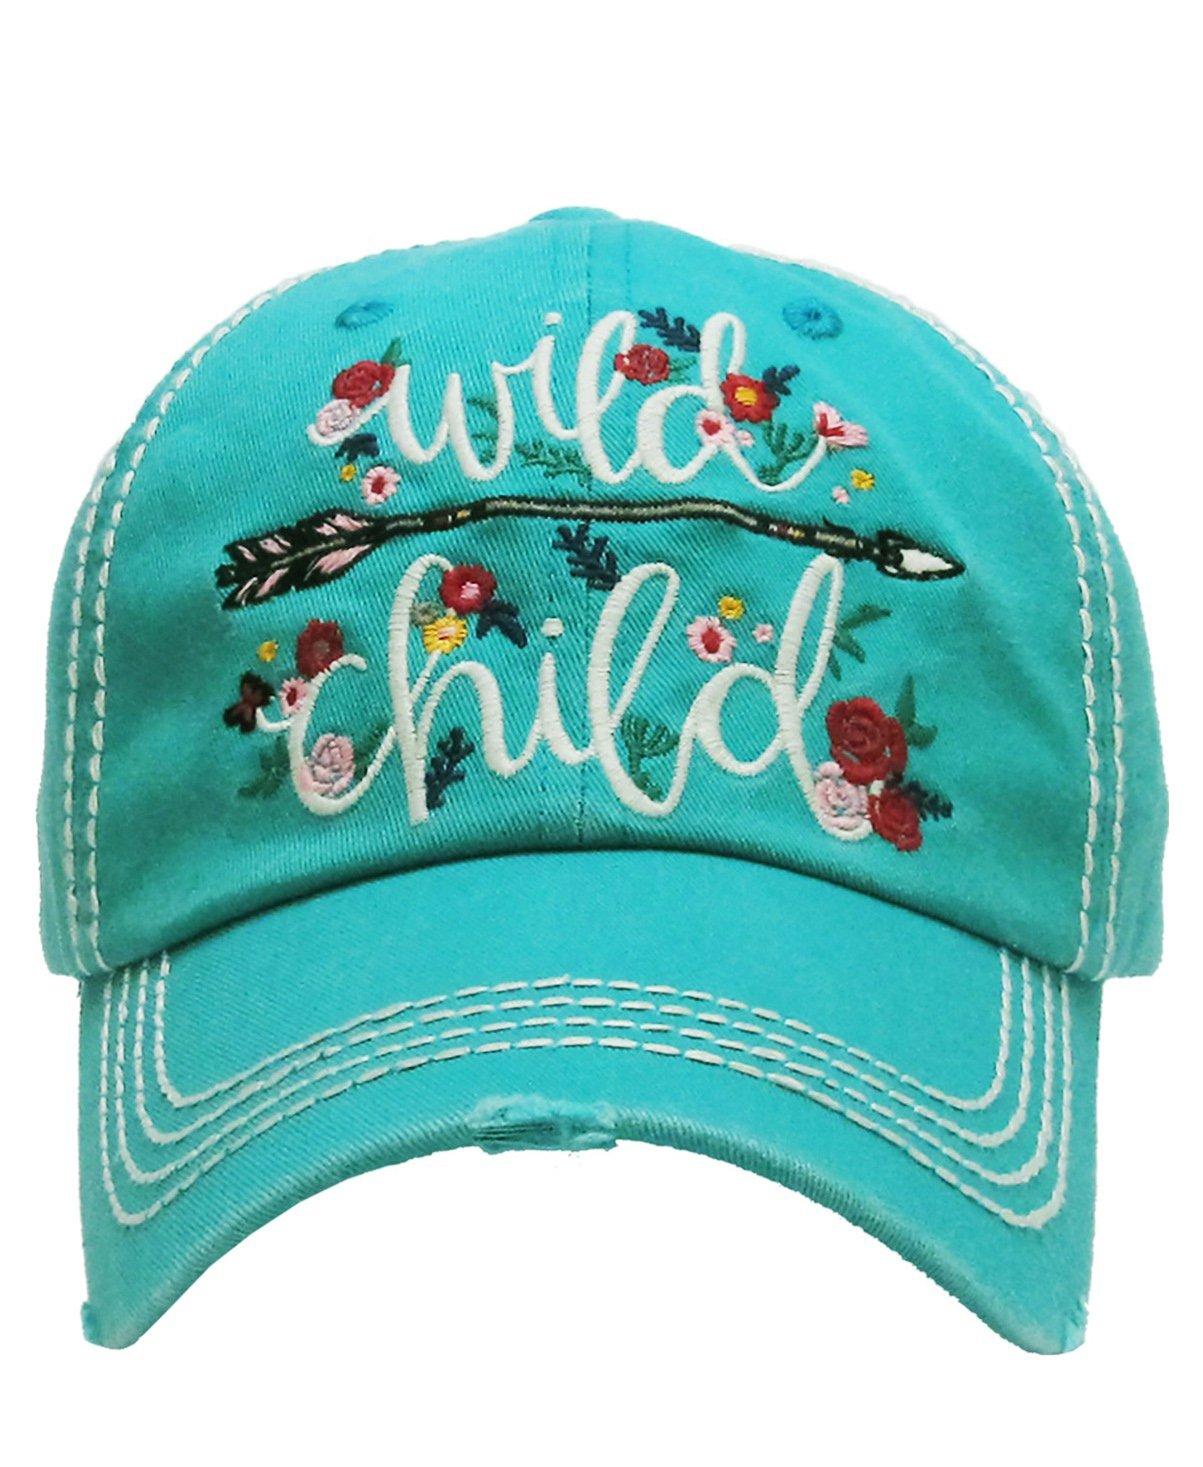 KBETHOS Vintage Collection New! Embroidered Wild Child Vintage Baseball Cap (Turquoise)